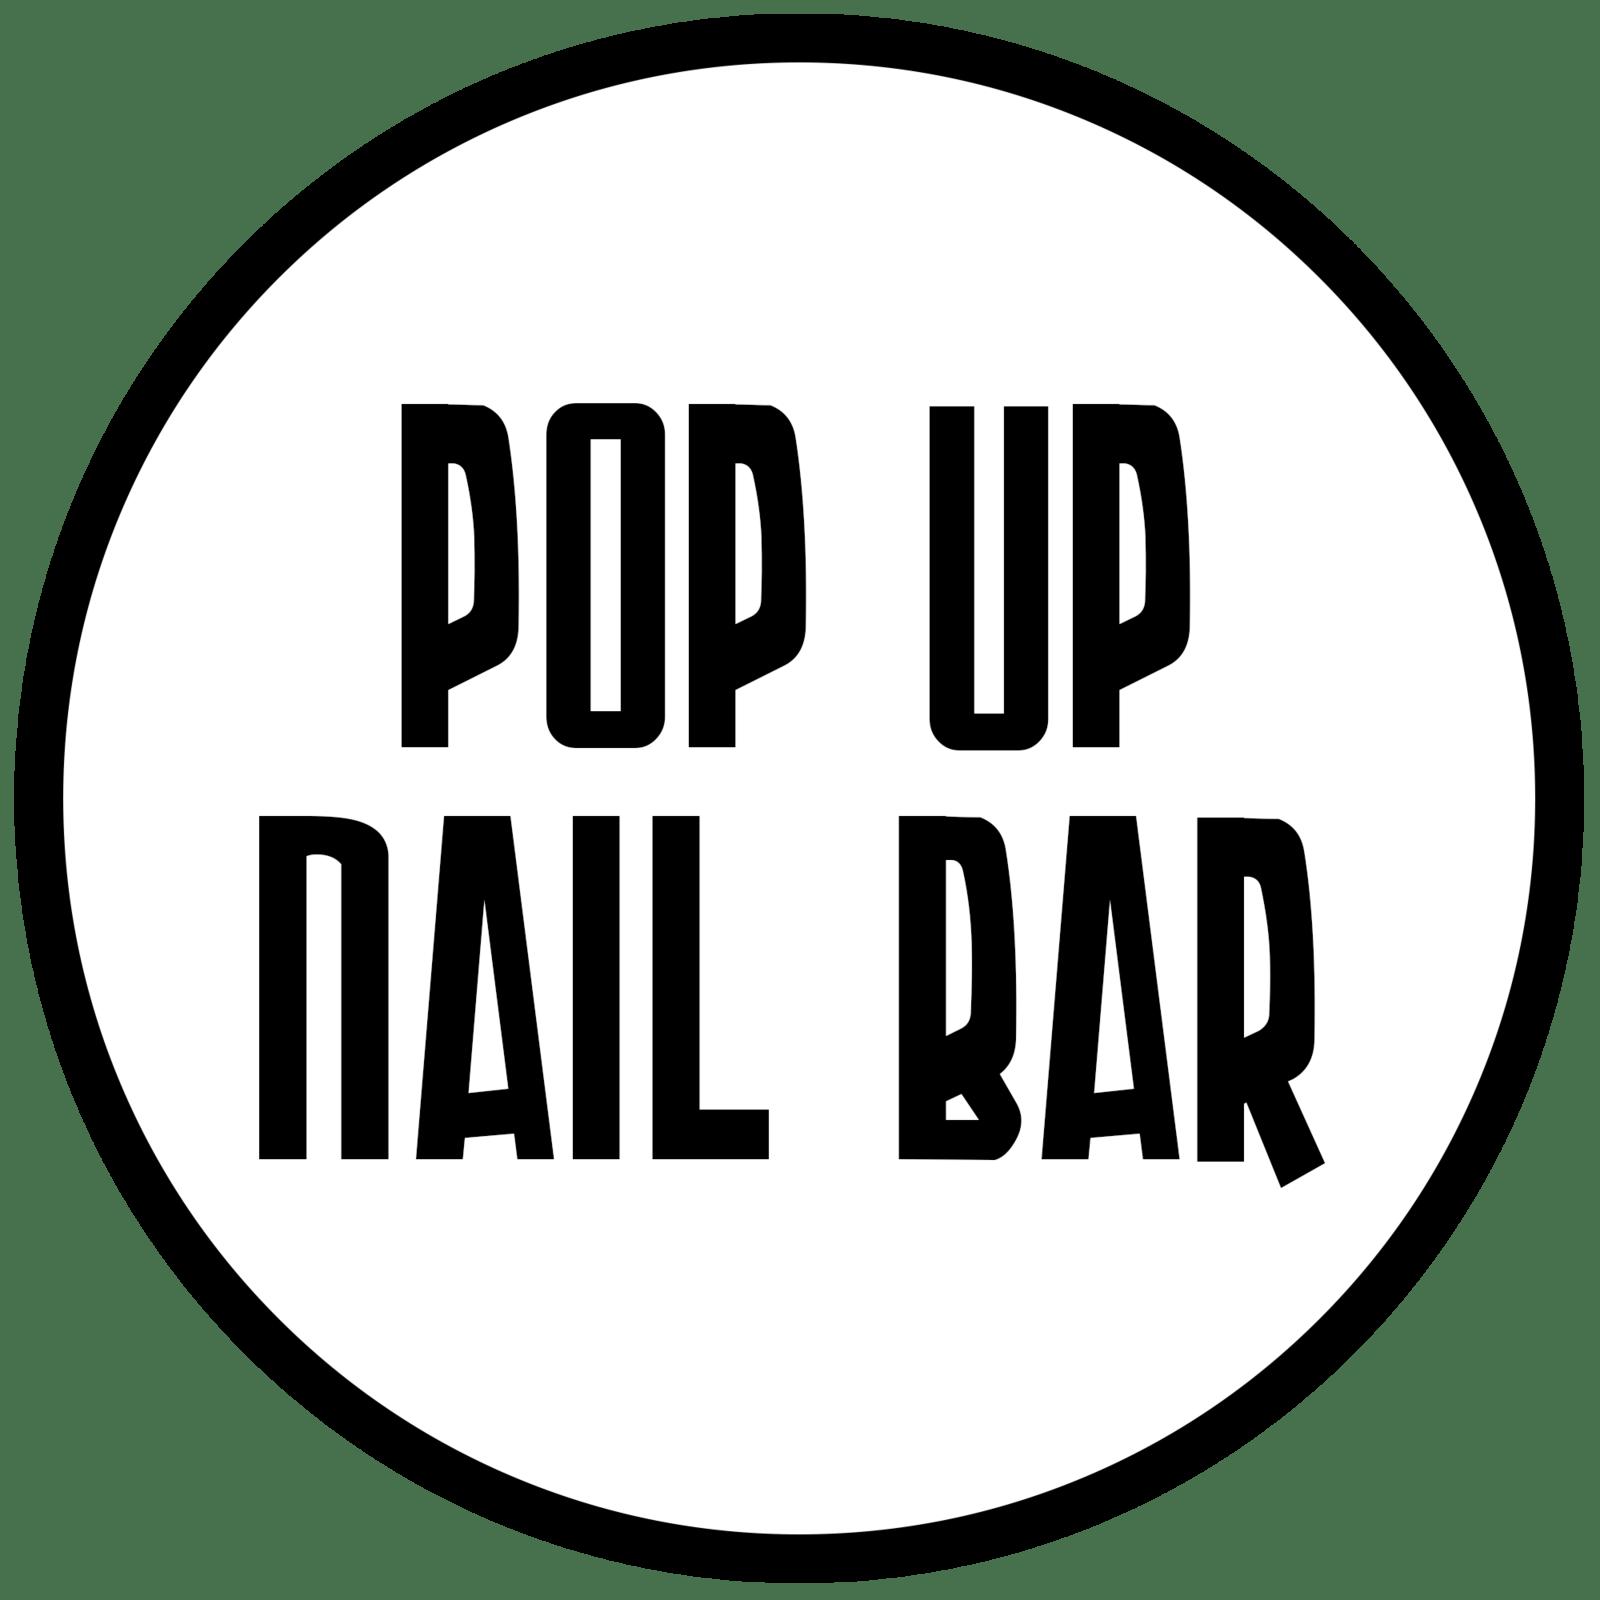 Manicure Clipart Nail Bar Manicure Nail Bar Transparent